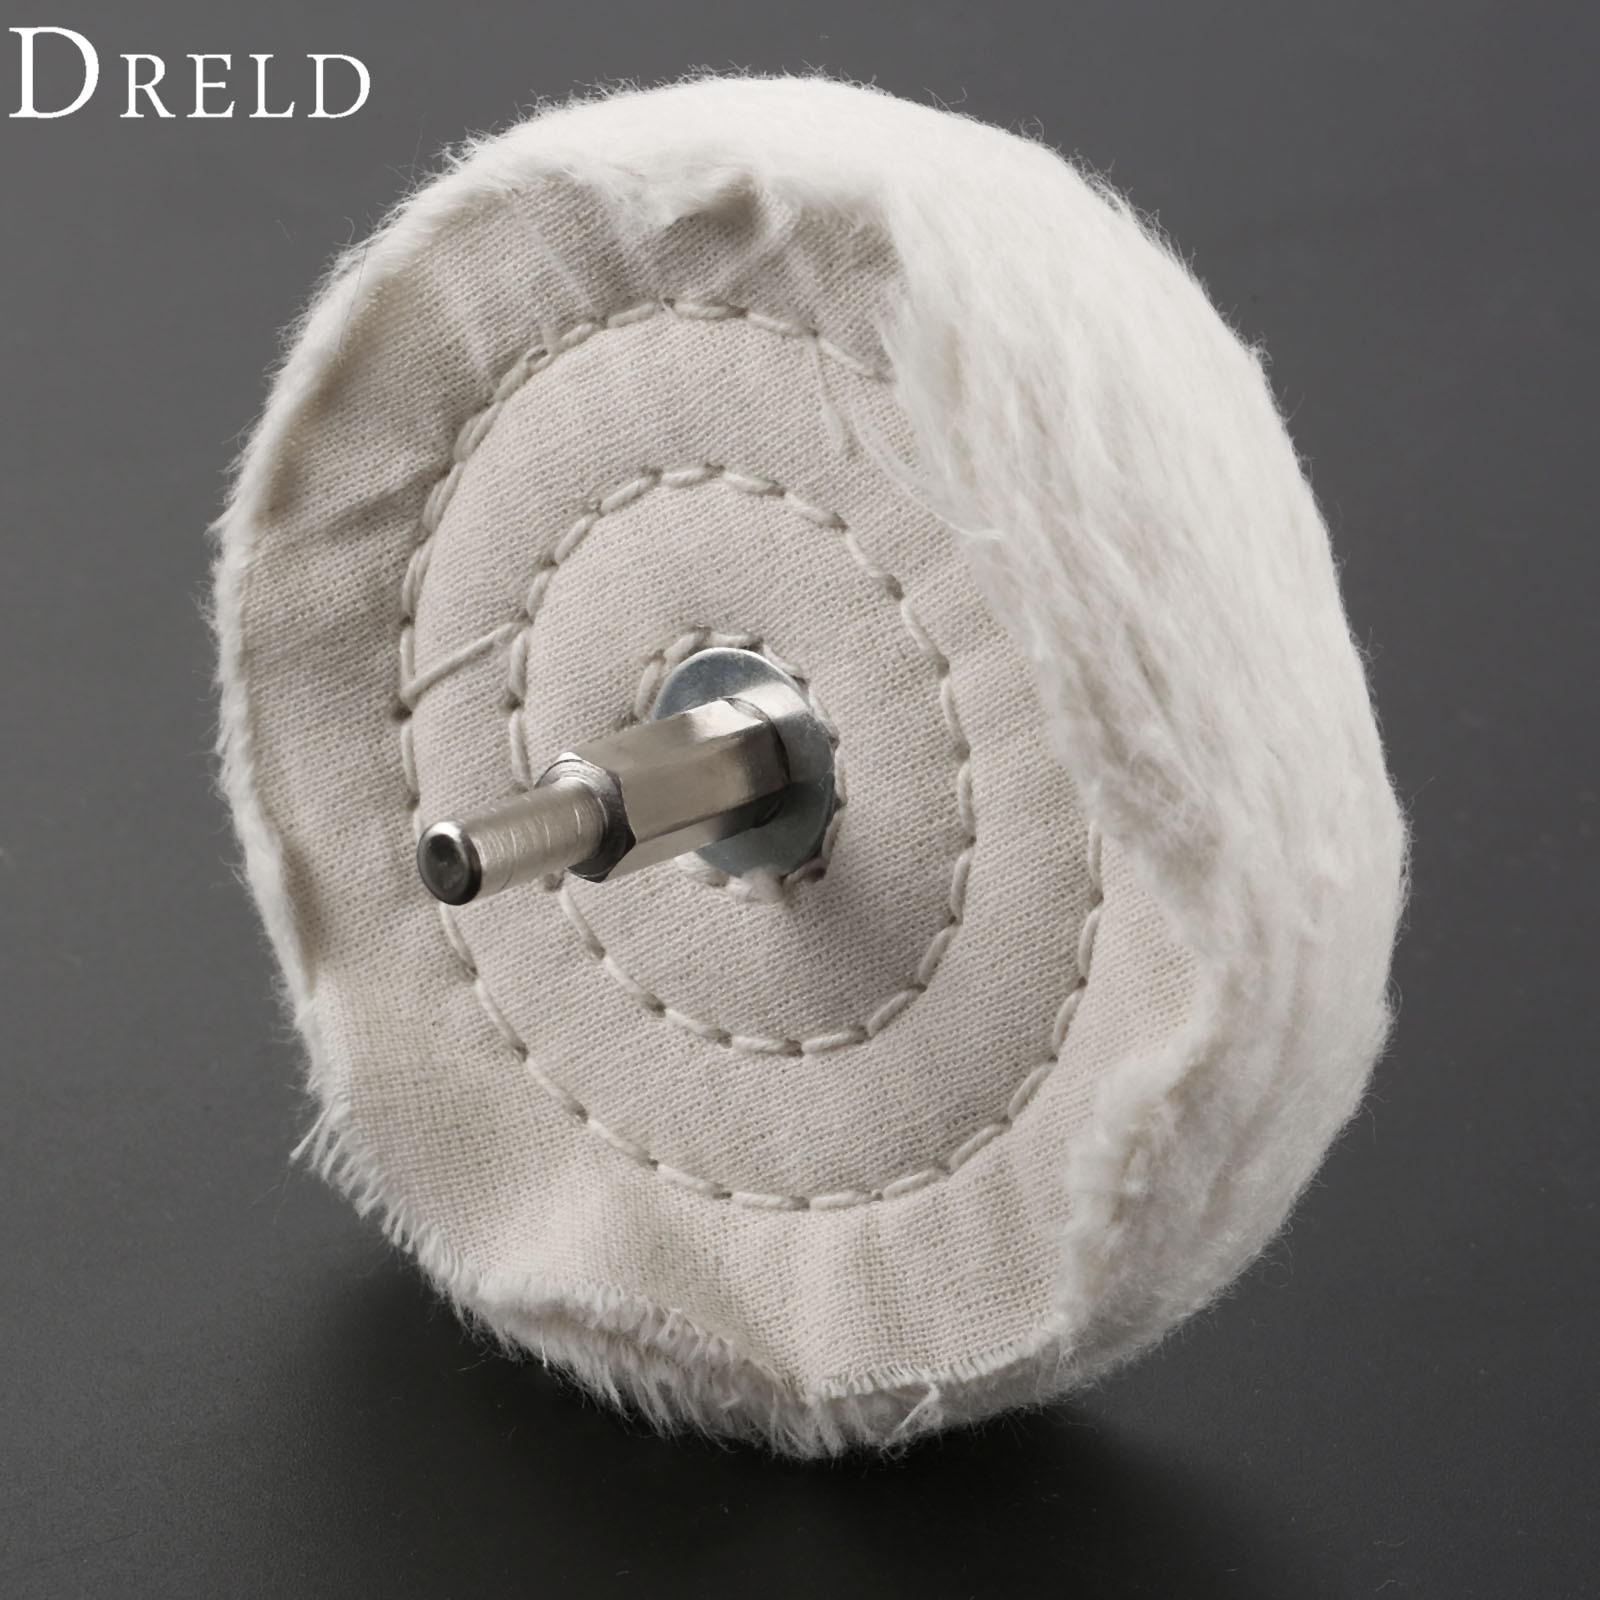 DRELD 1Pc Dremel Accessories 100mm /4